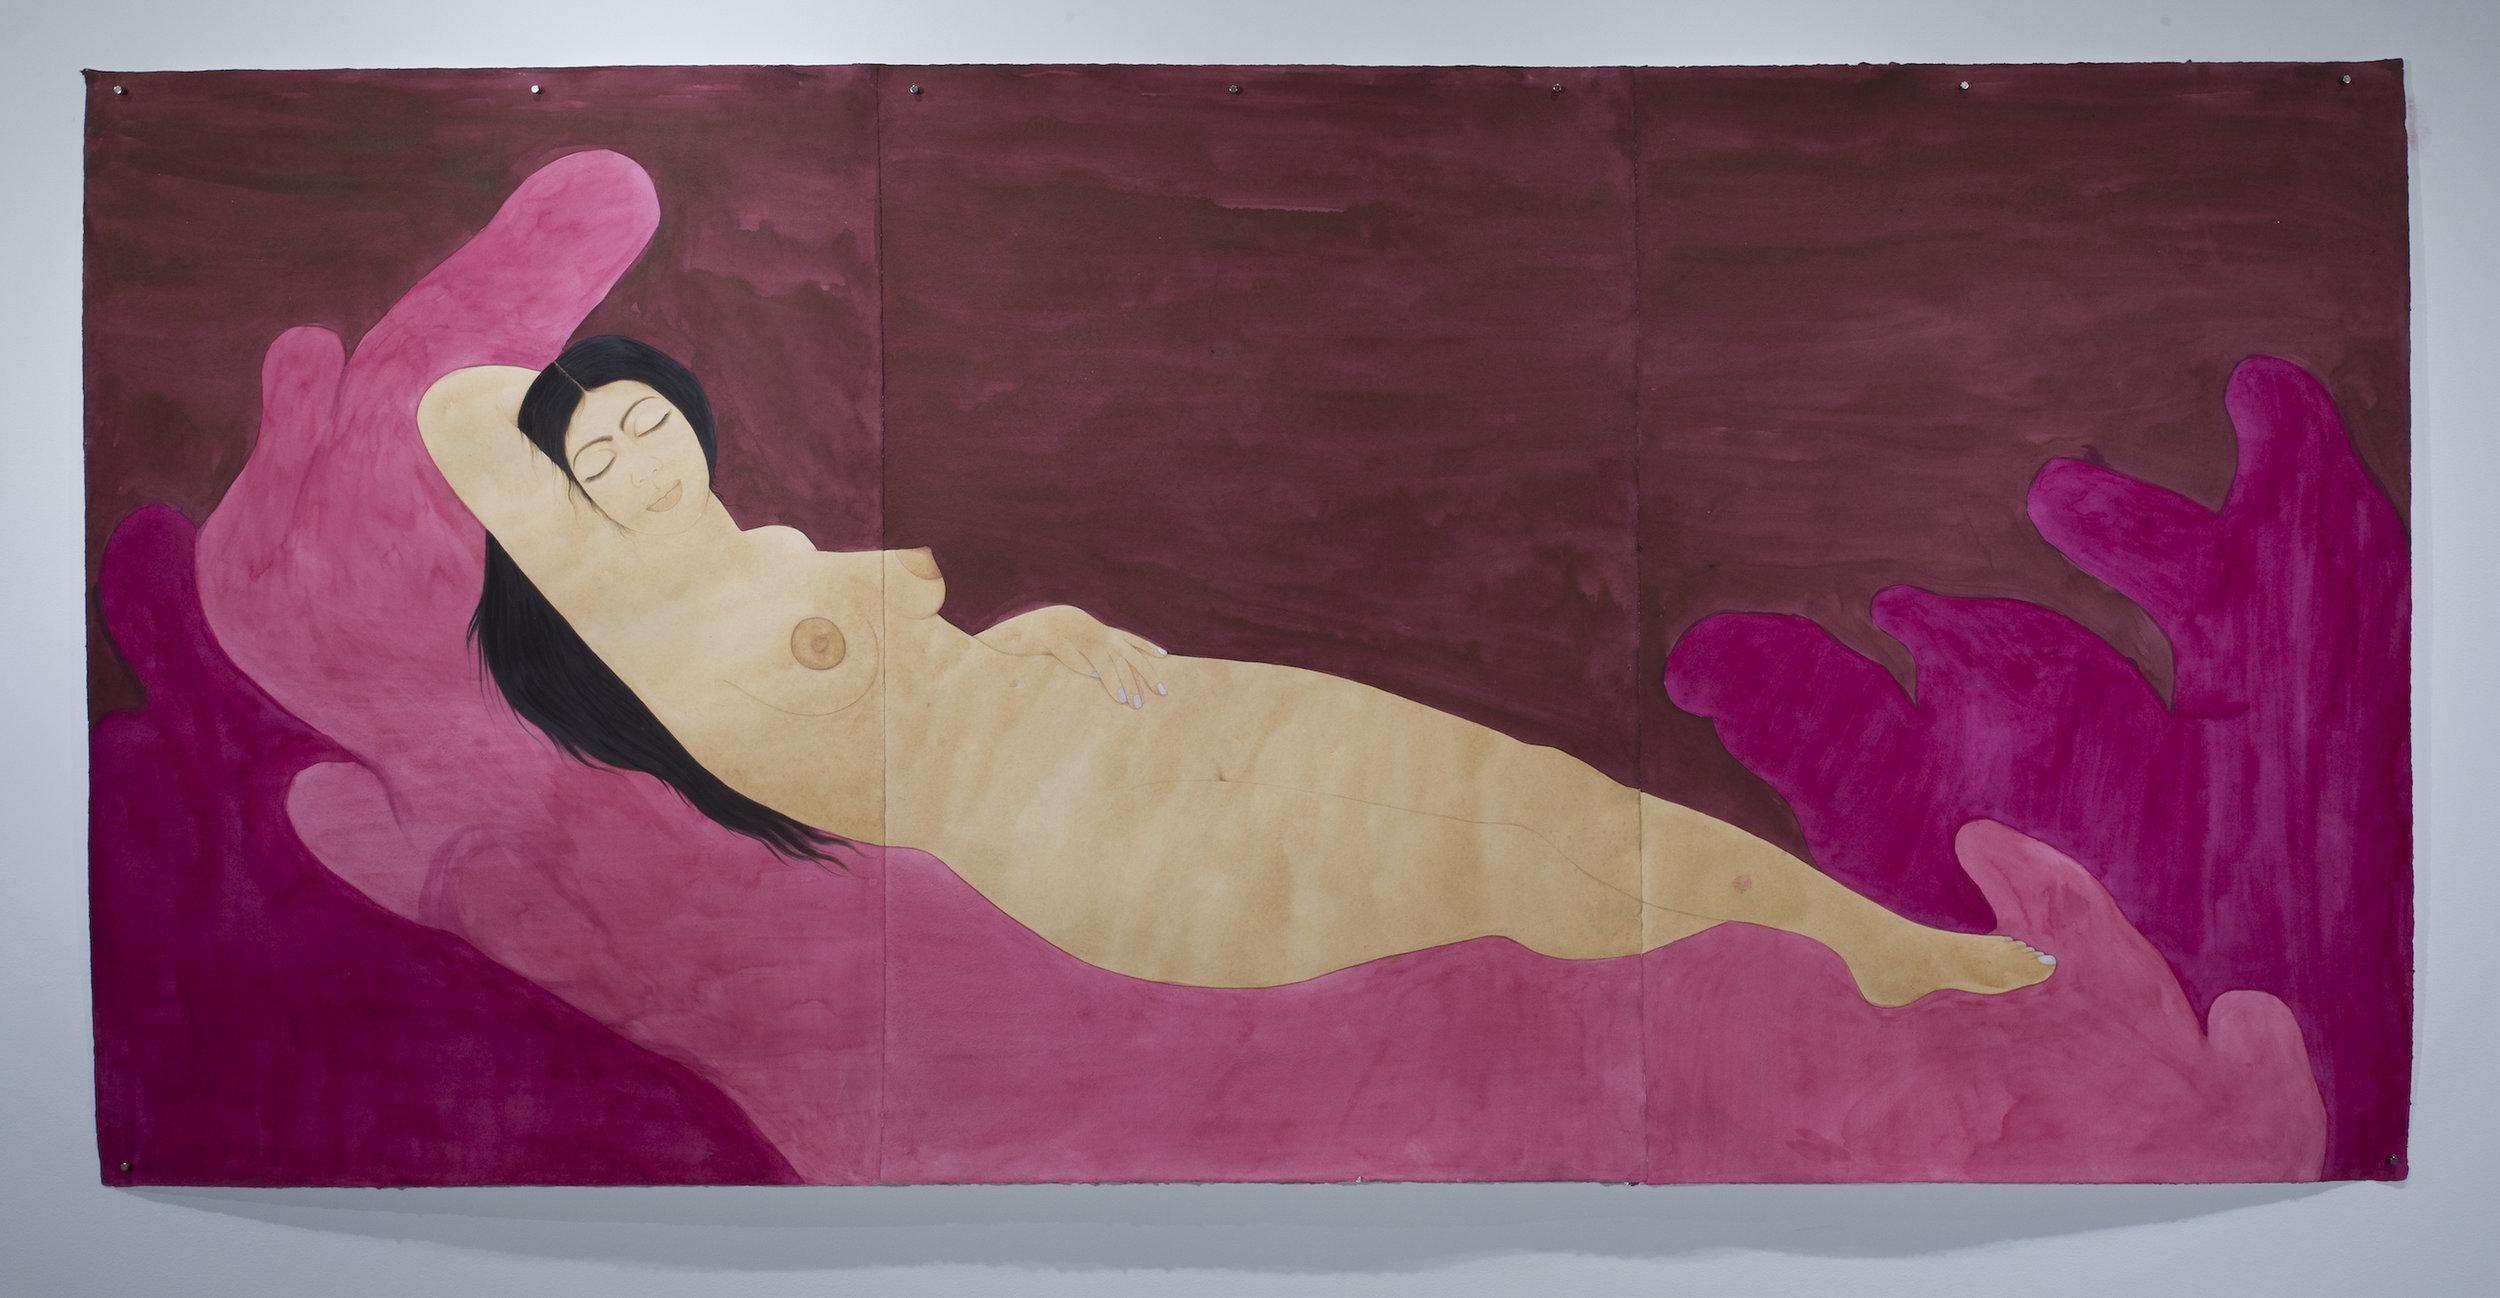 Hiba Schahbaz - Self-Portrait as Sleeping Venus (after Giorgione)